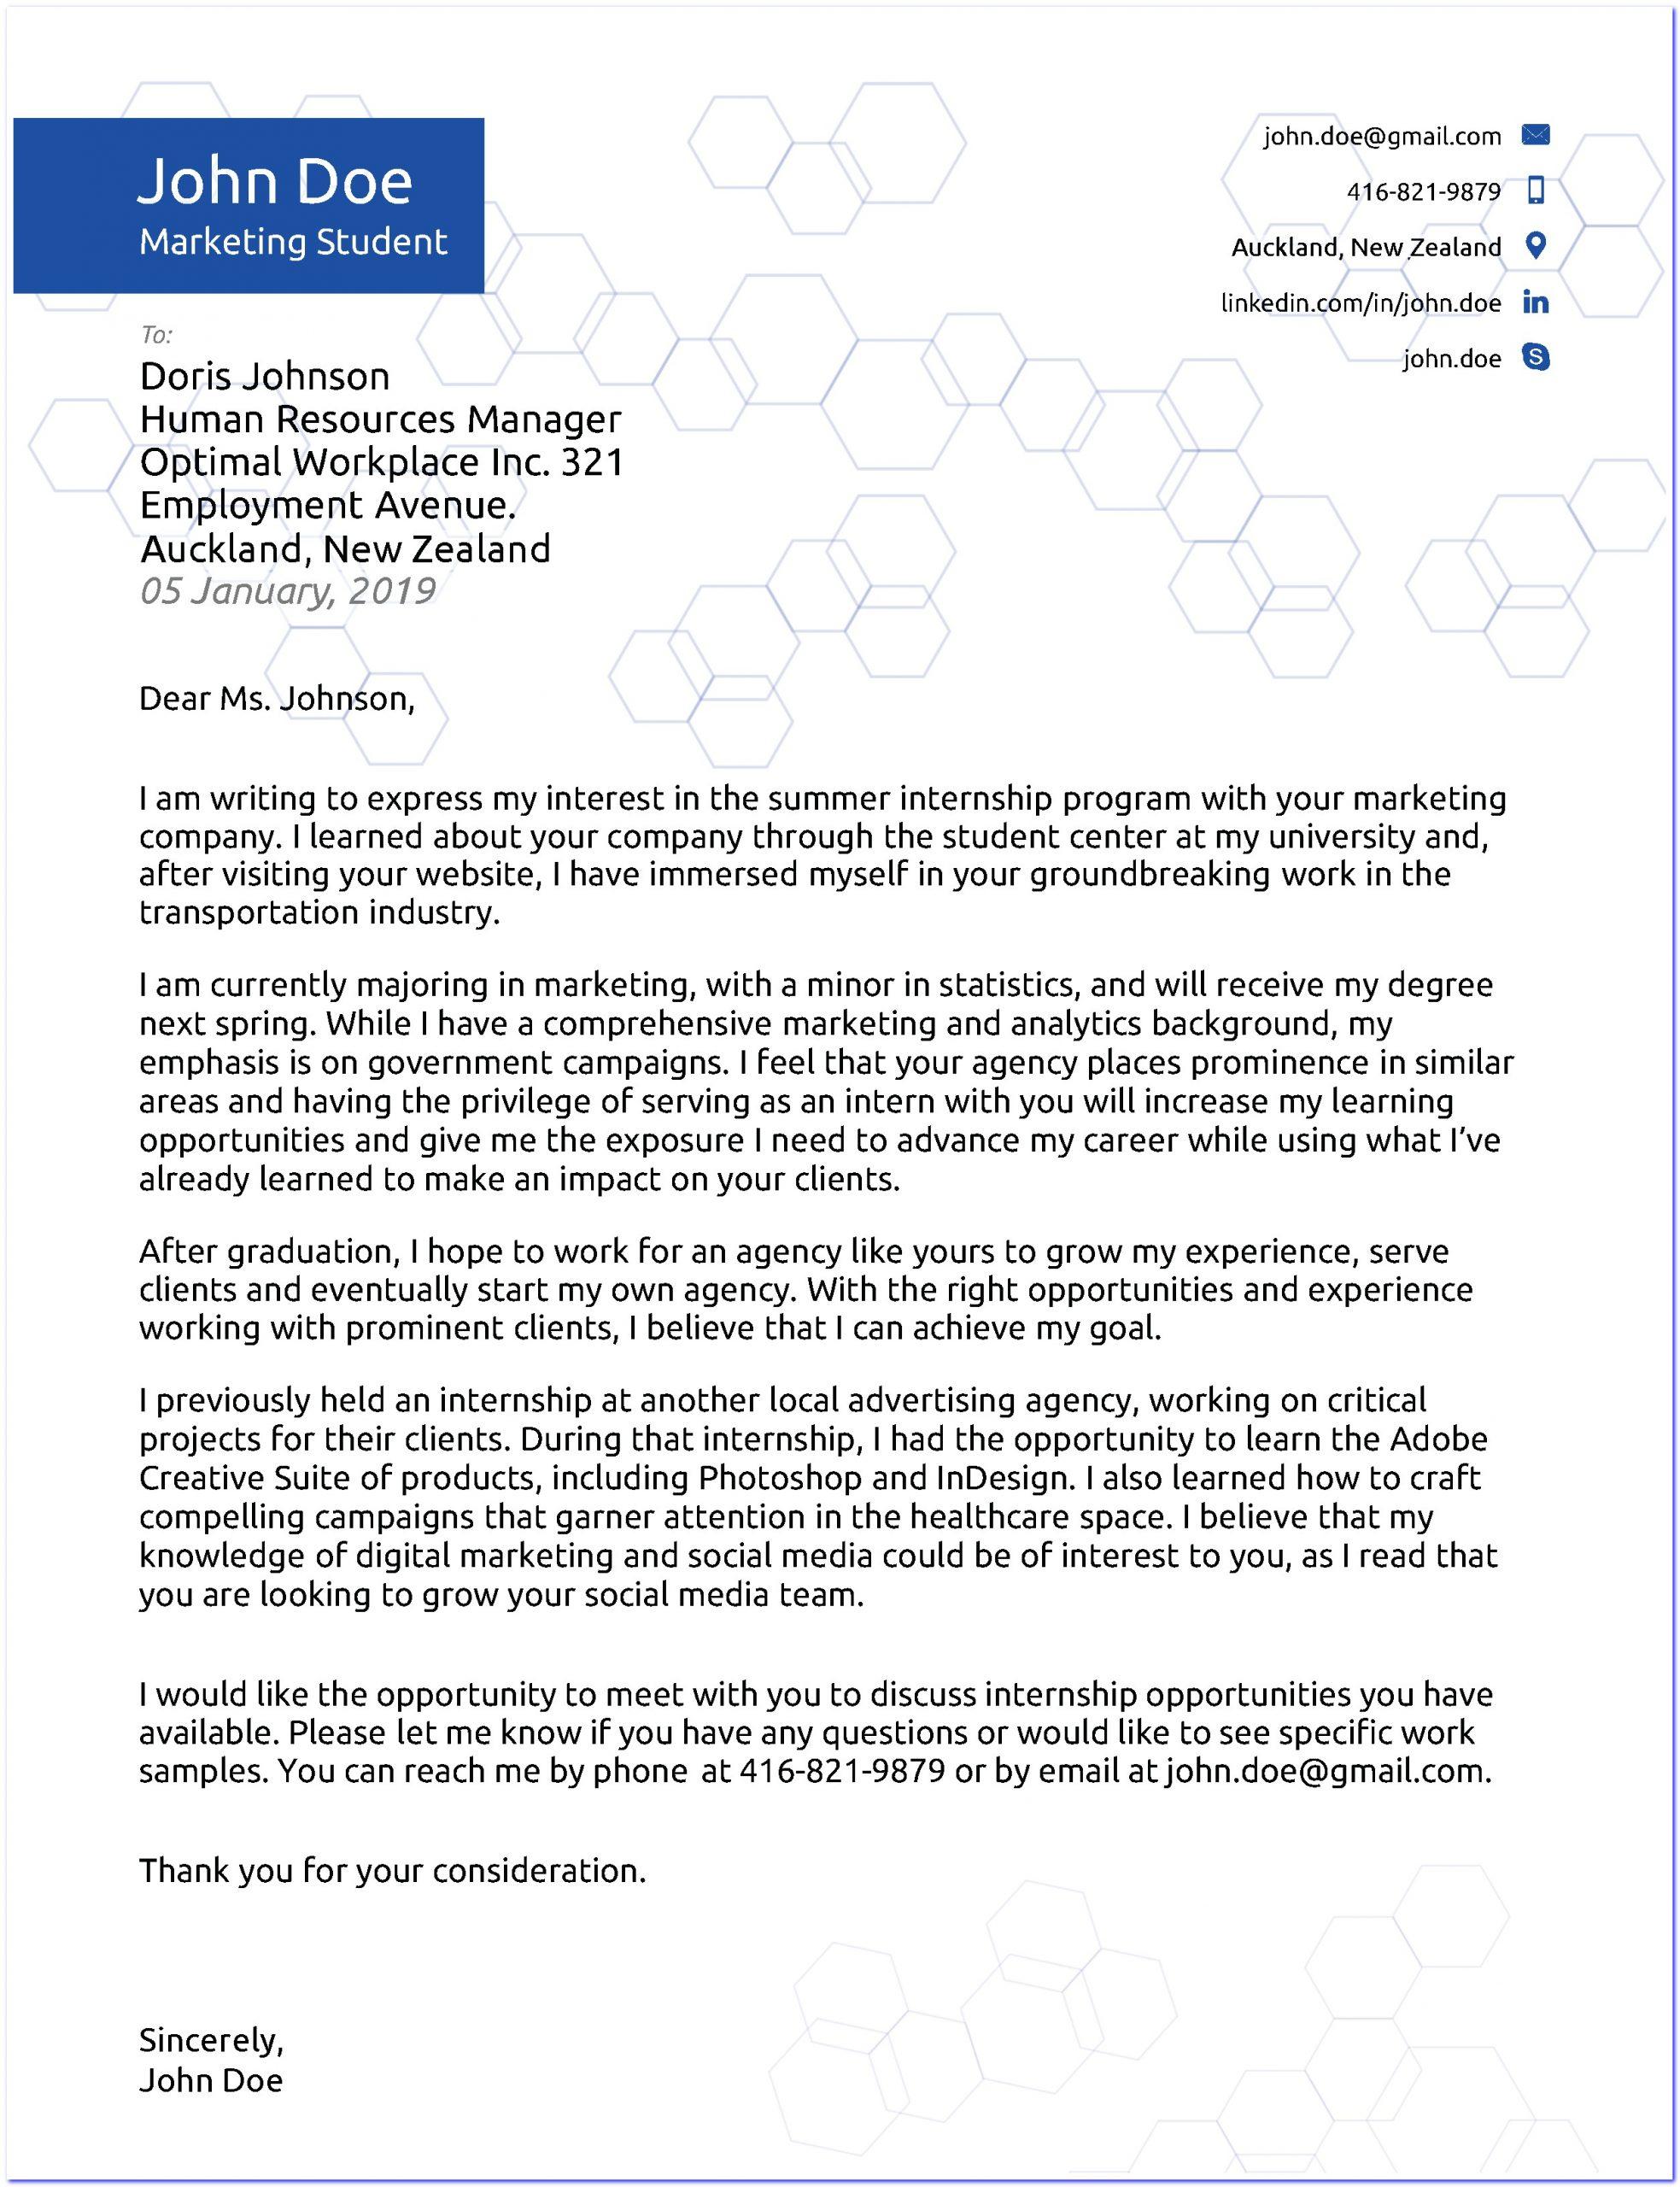 Summer Internship Cover Letter Samples from doldurcv.com